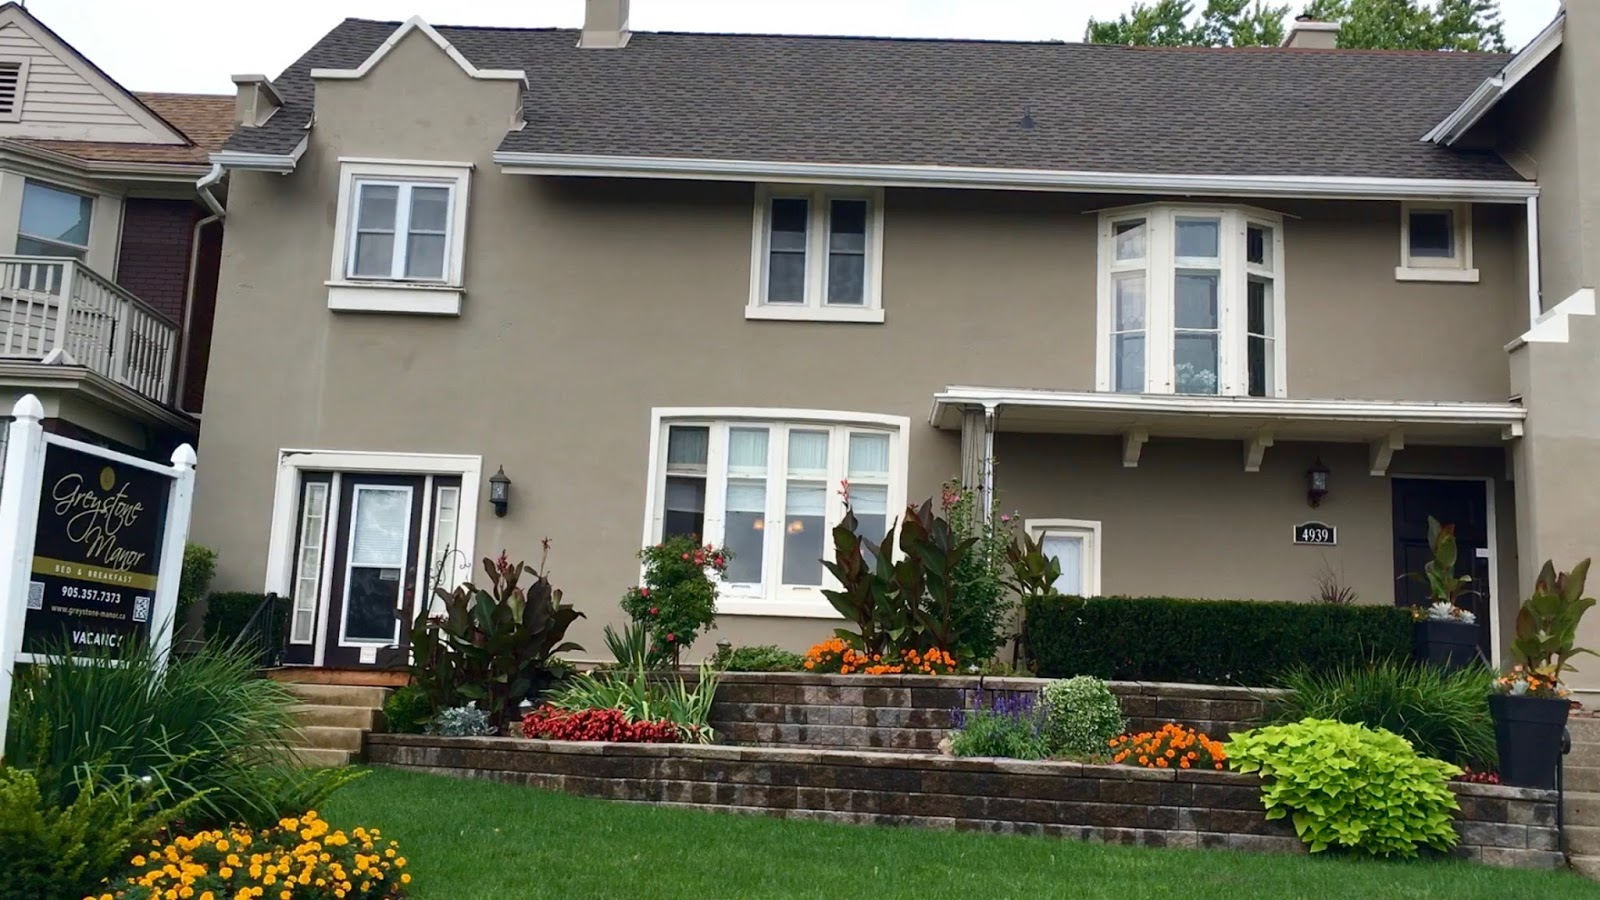 Retired In Delaware The Greystone Manor Niagara Falls